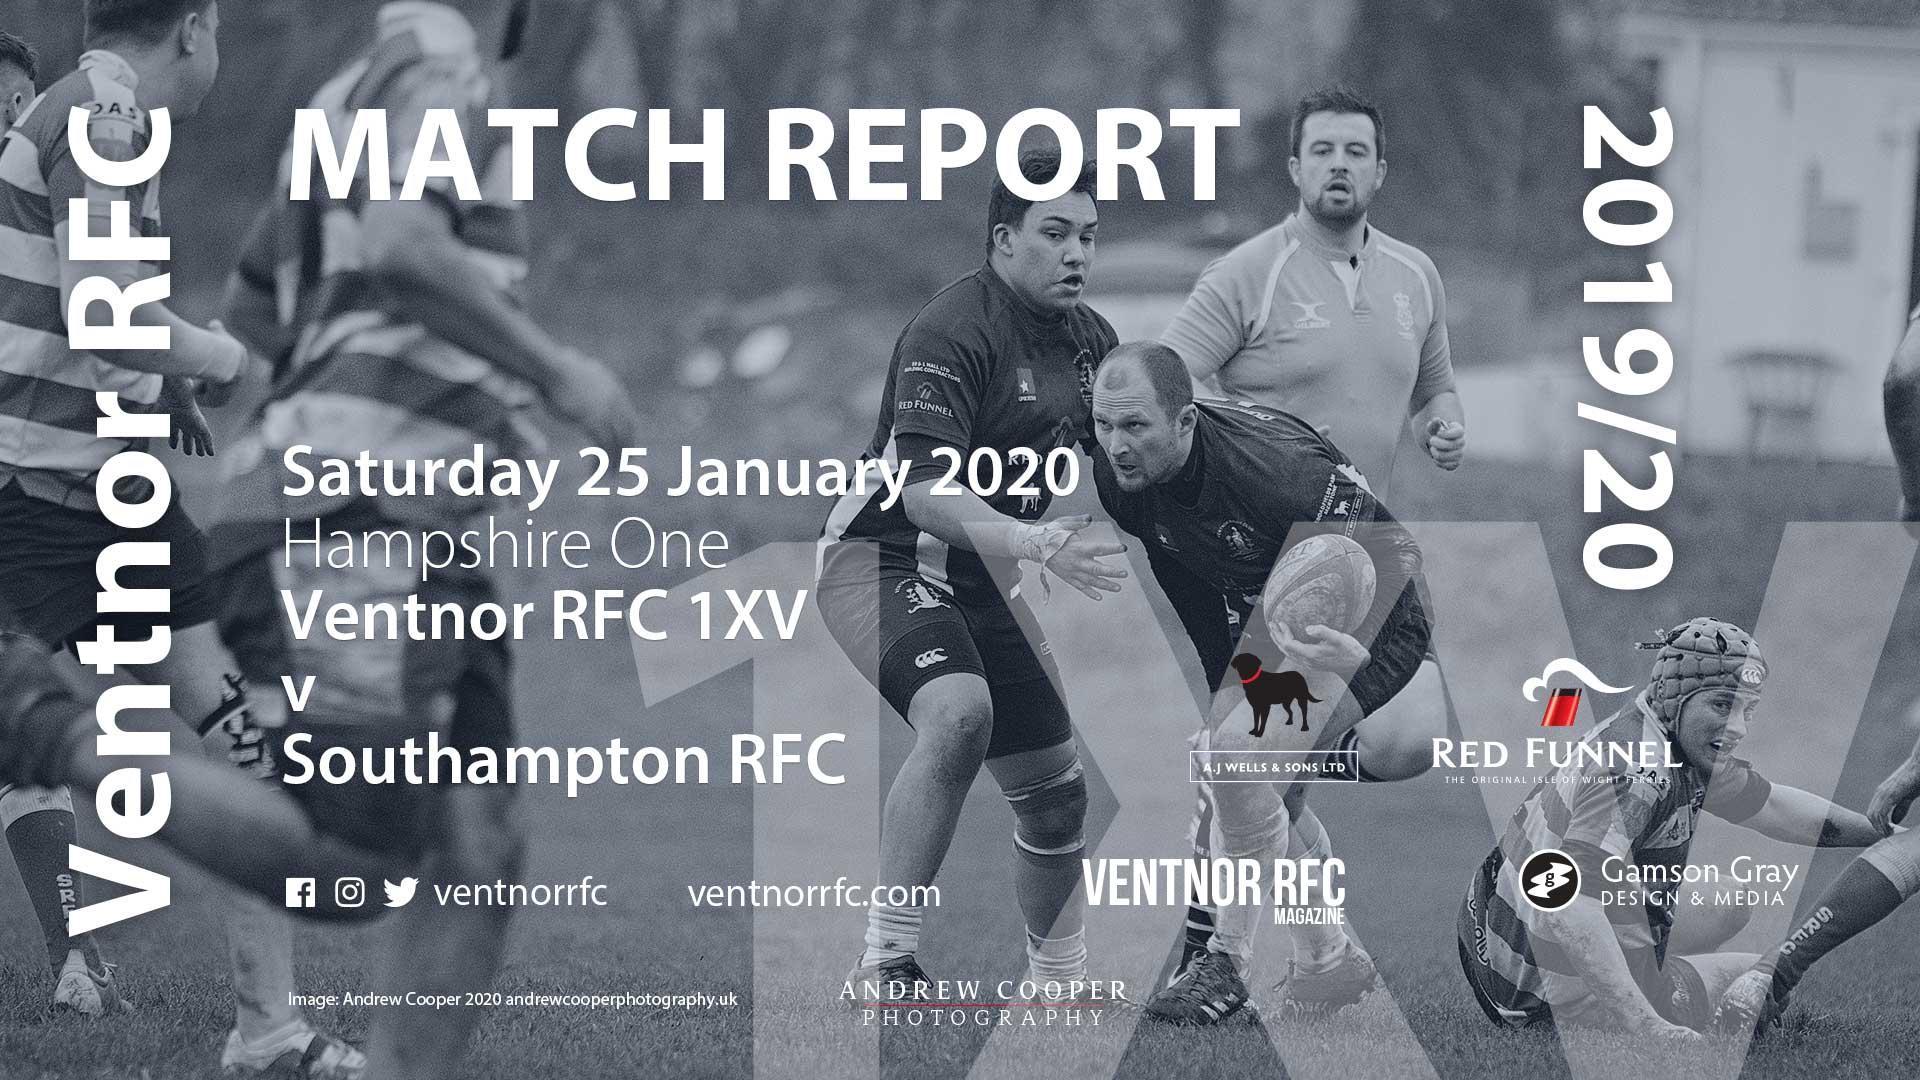 Ventnor RFC 1XV 51-22 Southampton RFC, 25 Jan 2020